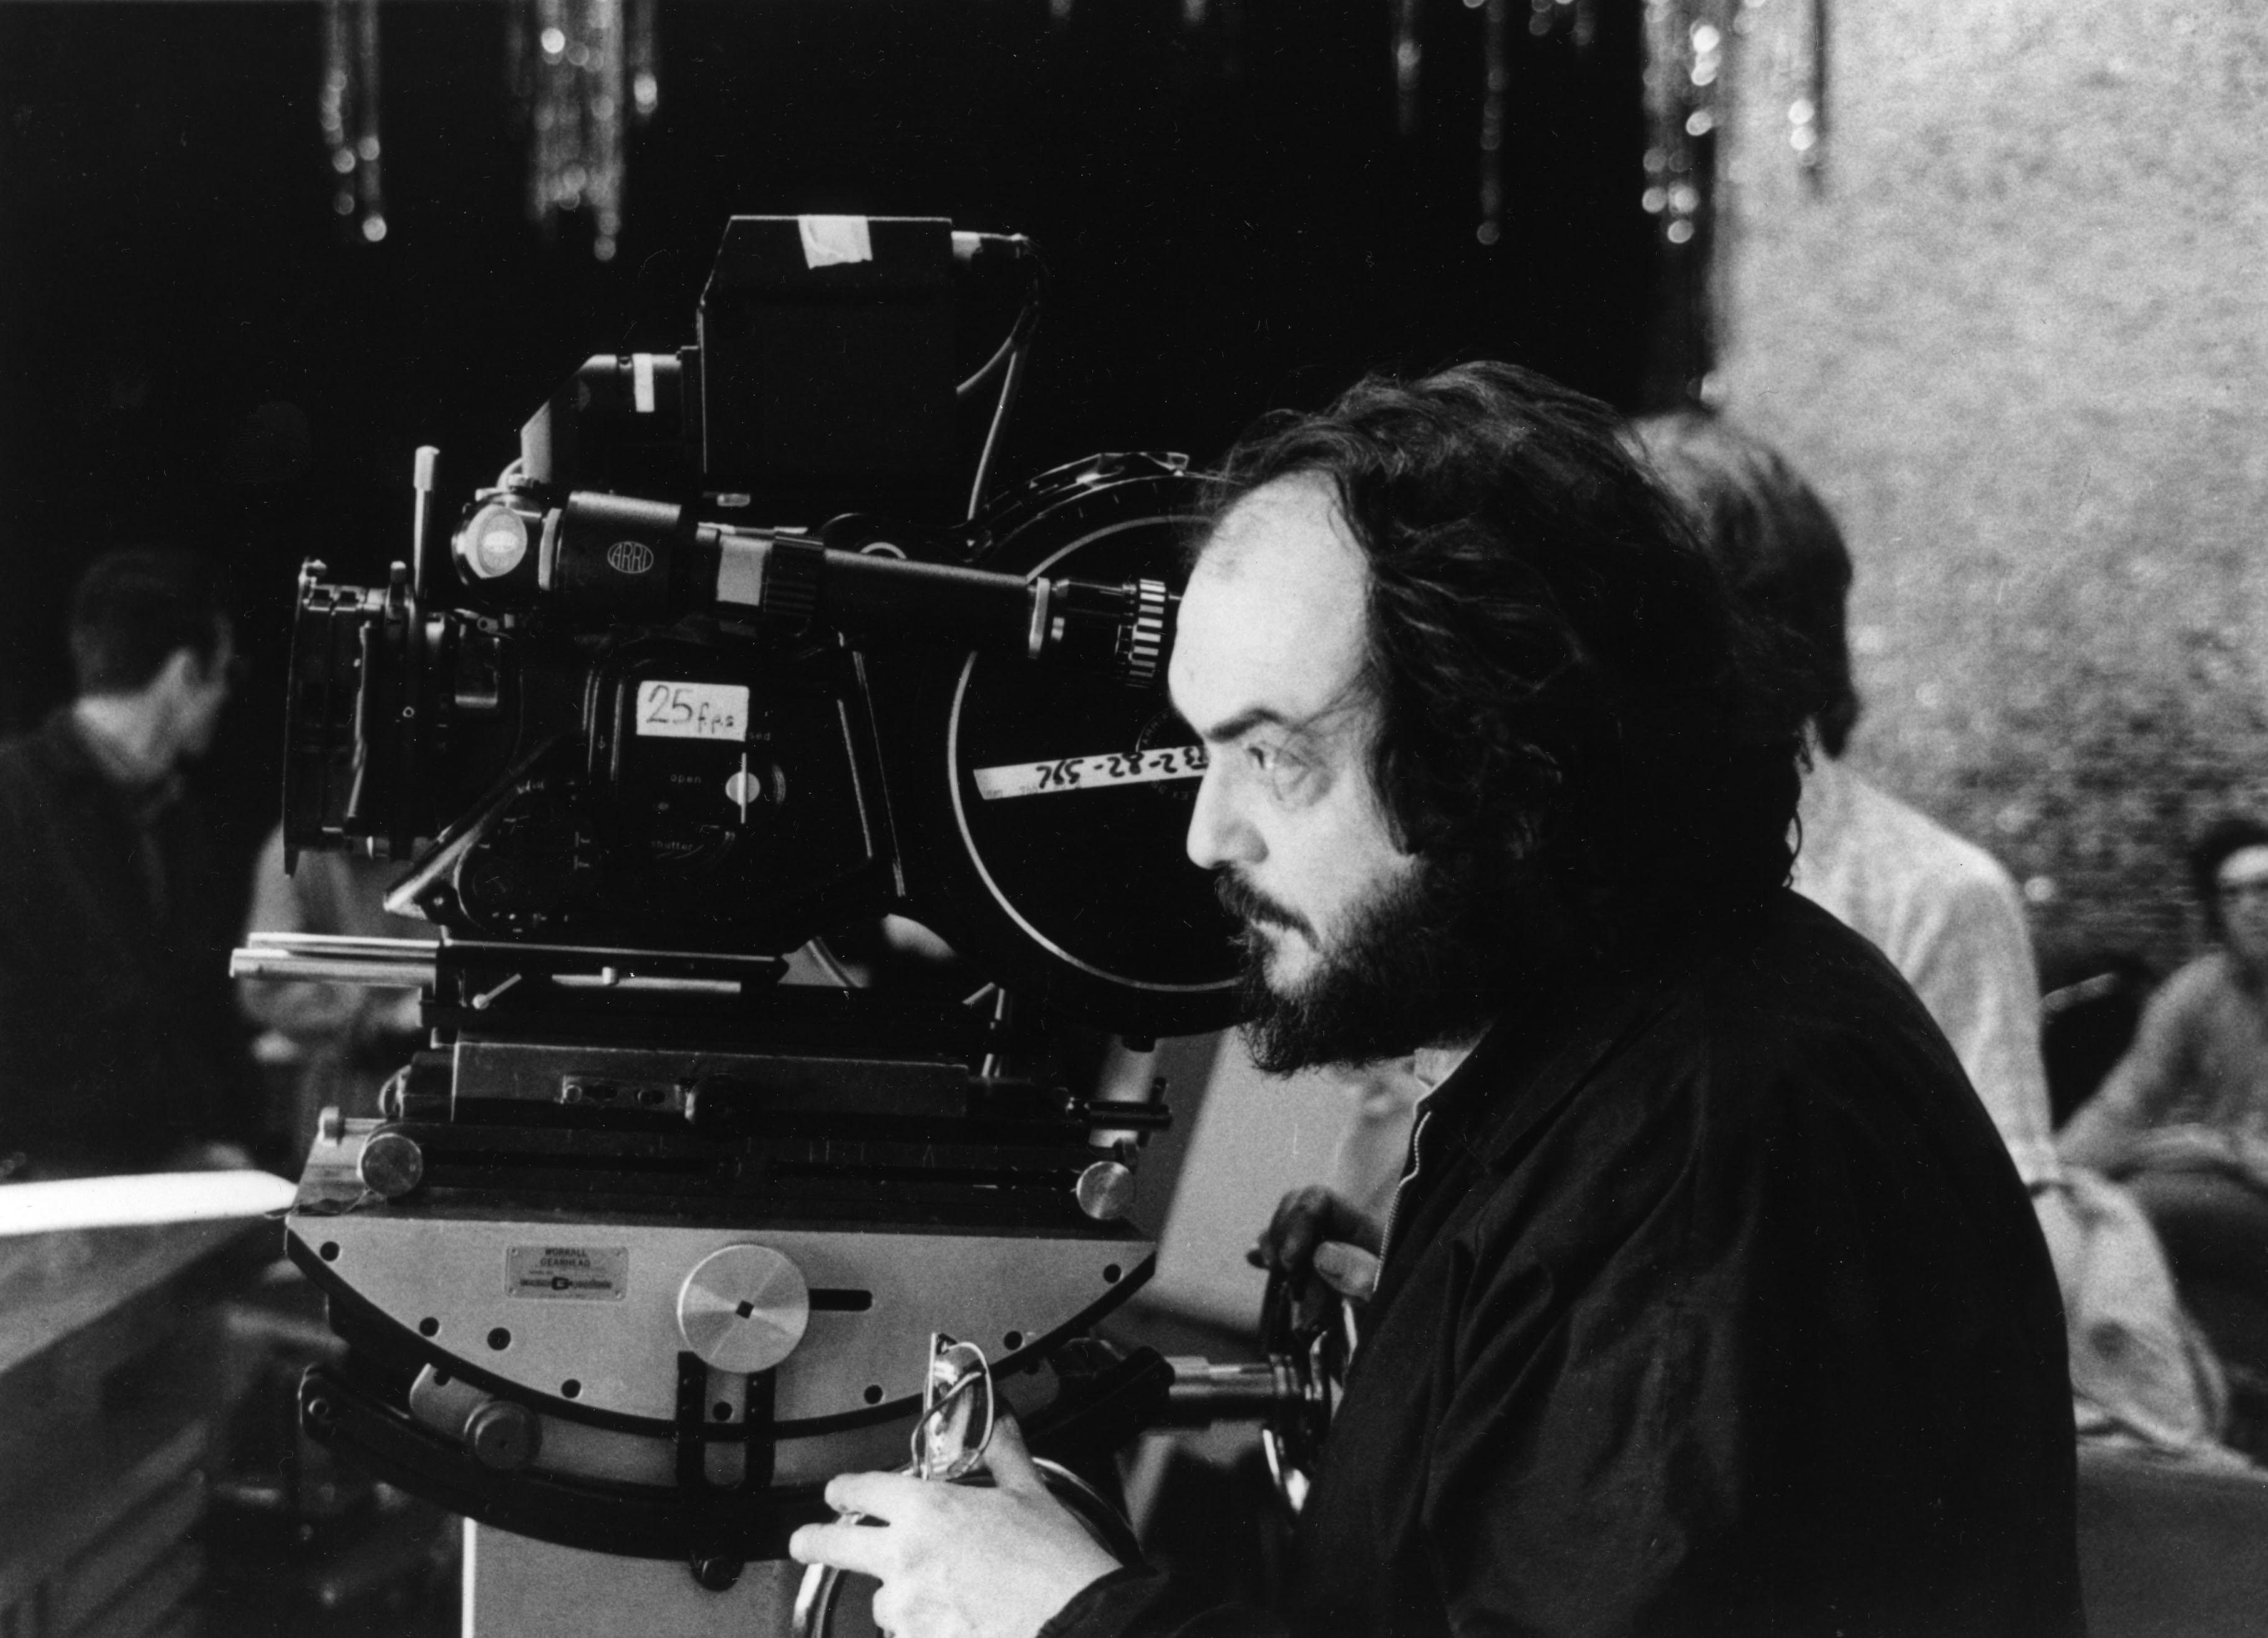 rollingstone.com - Daniel Kreps - Stanley Kubrick's 'Lost' Screenplay 'Burning Secret' Unearthed